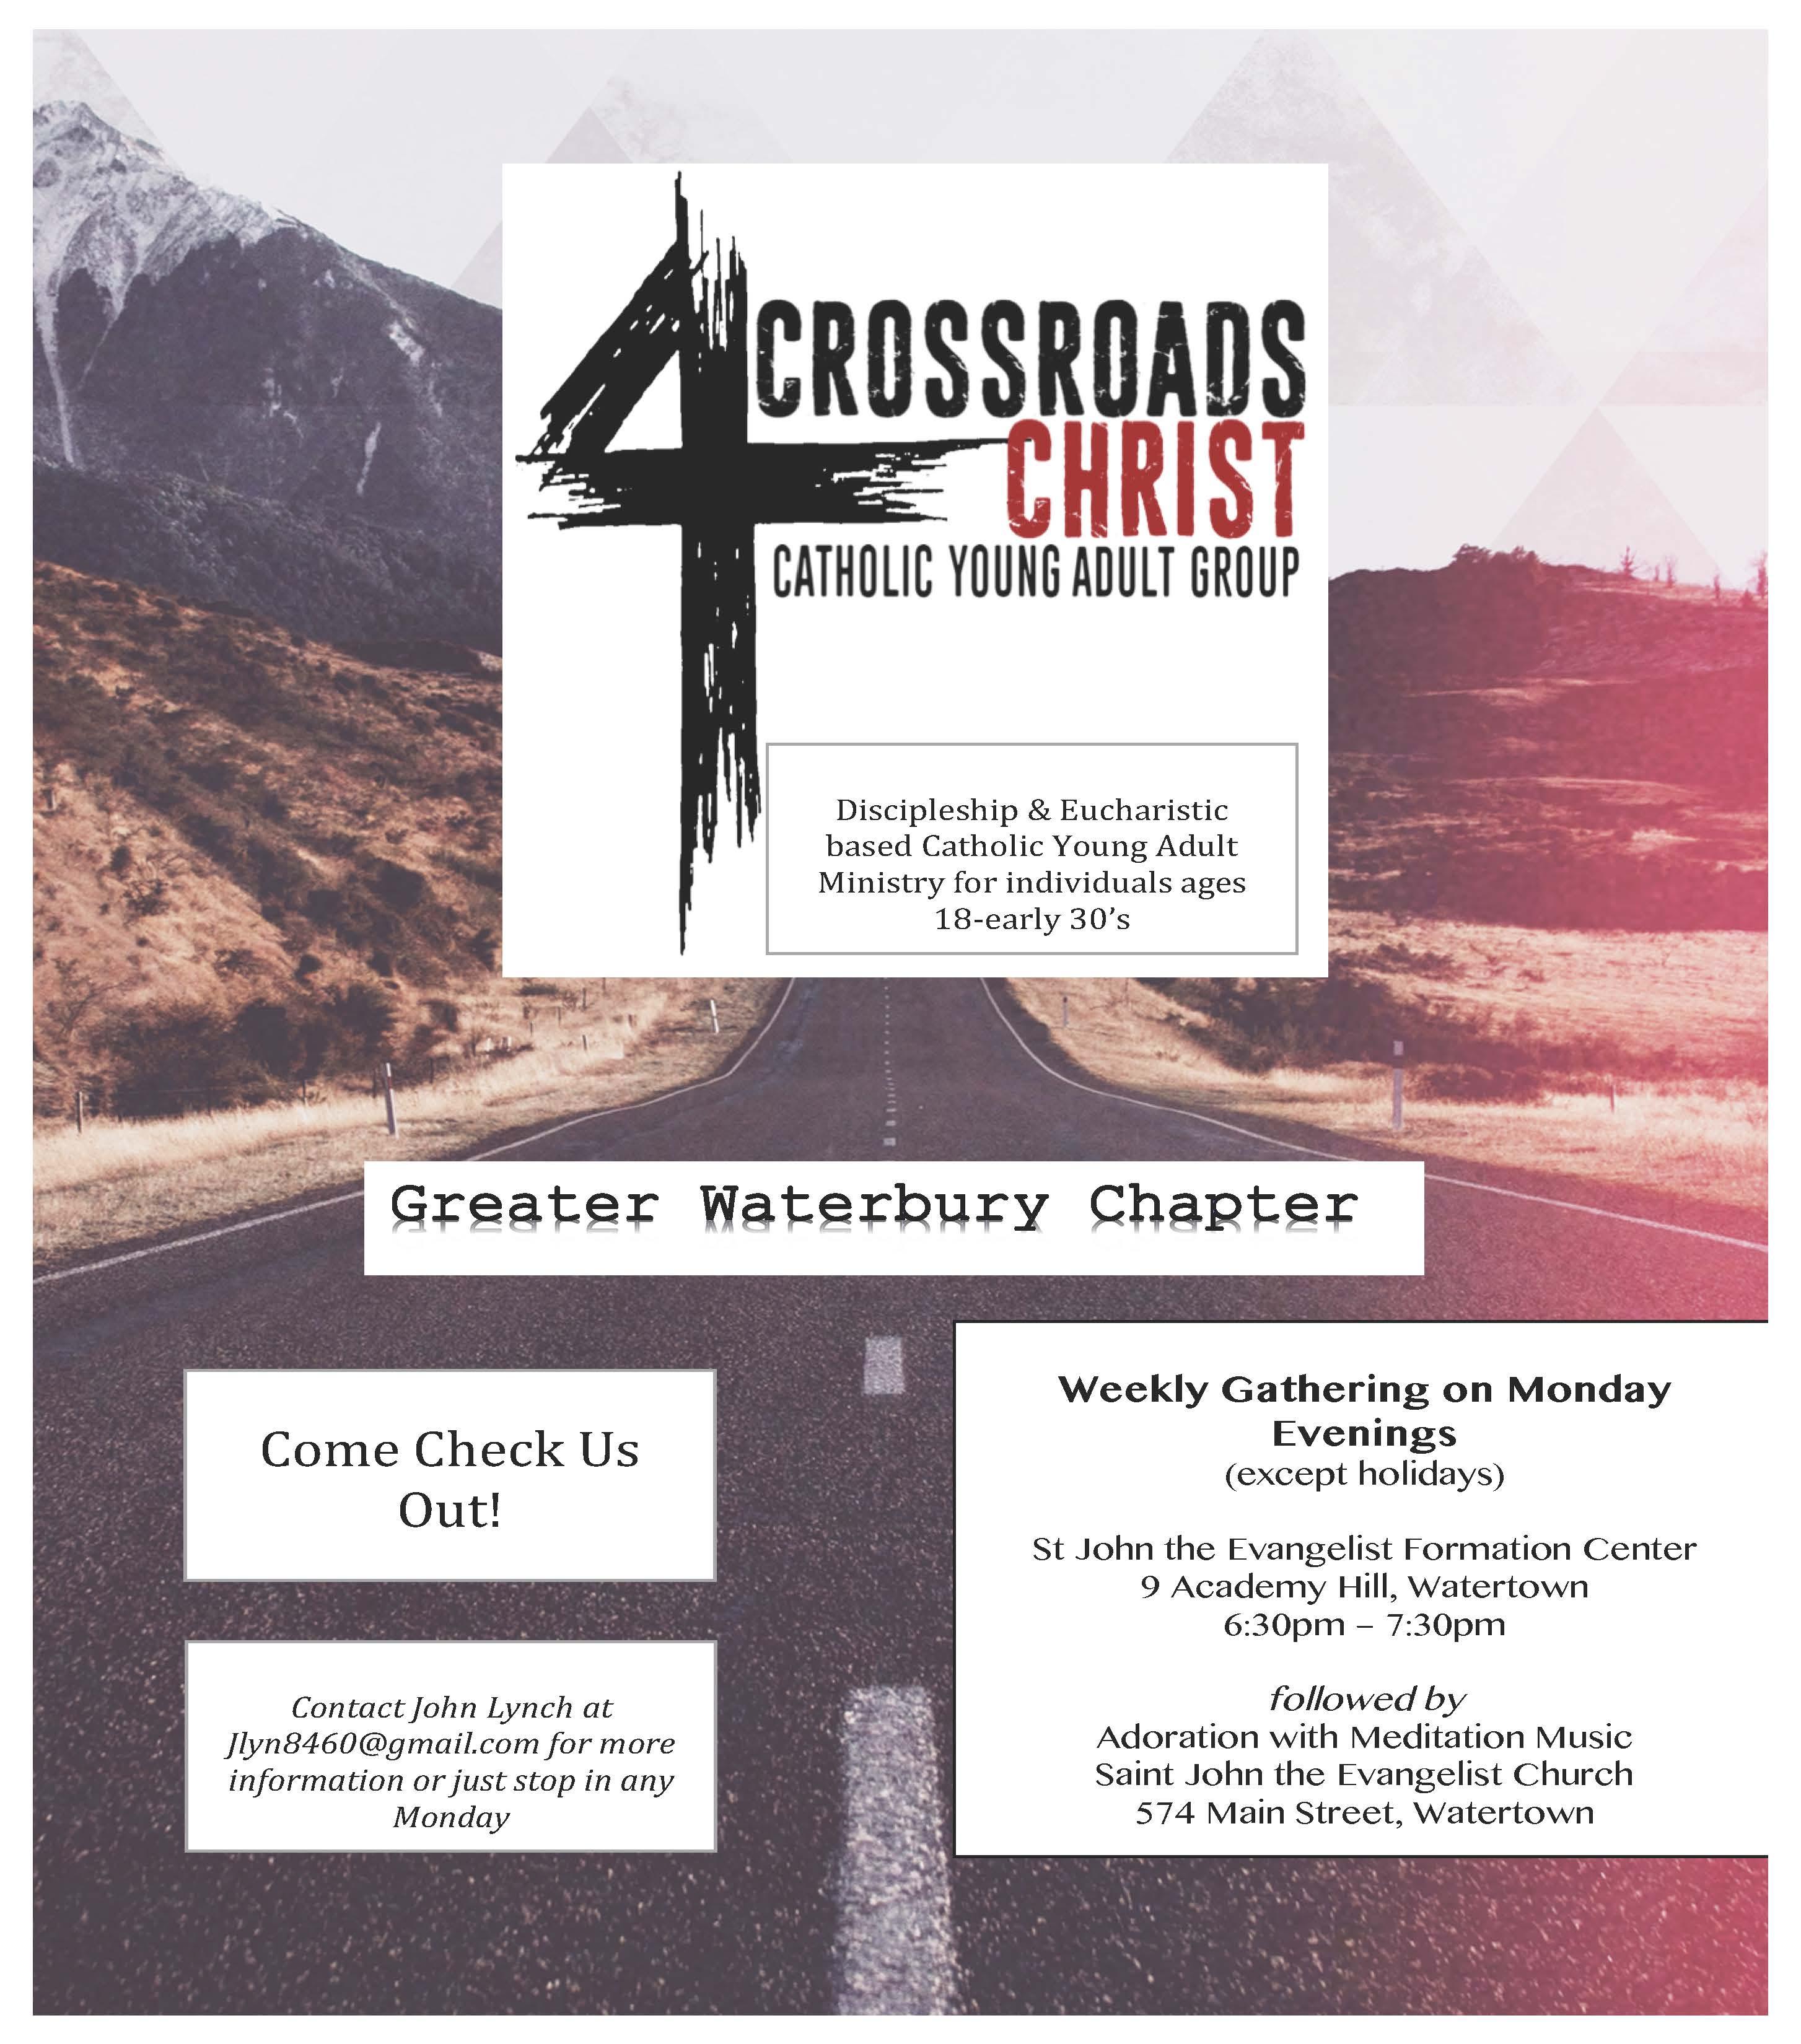 Crossroads 4 Christ